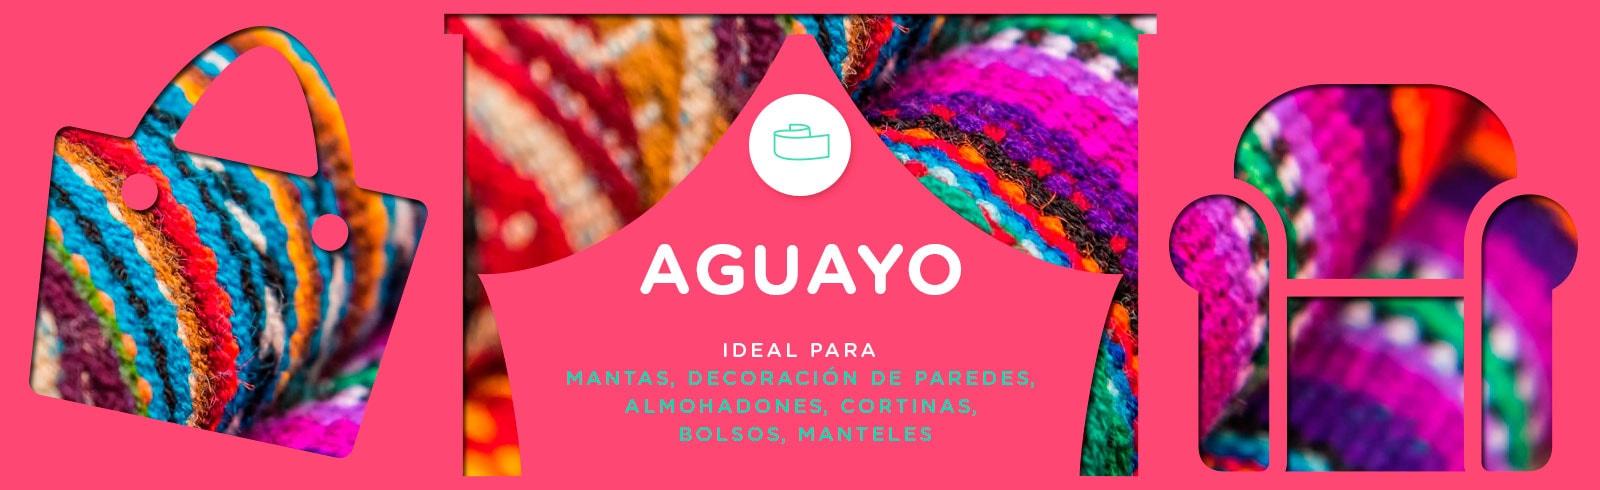 slide-aguayo